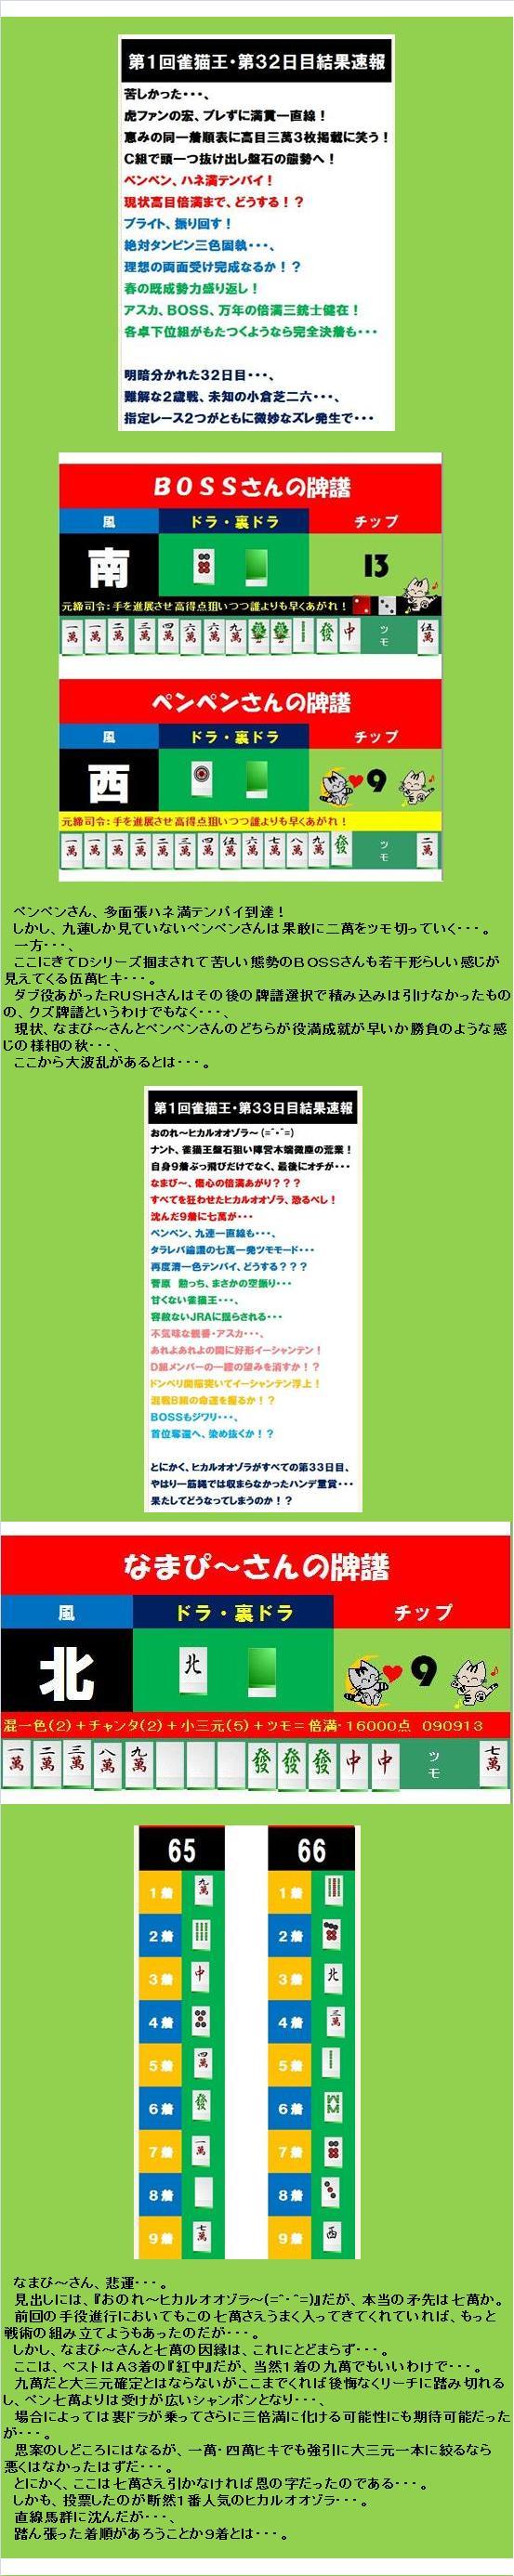 20100226・A組回顧16.jpg